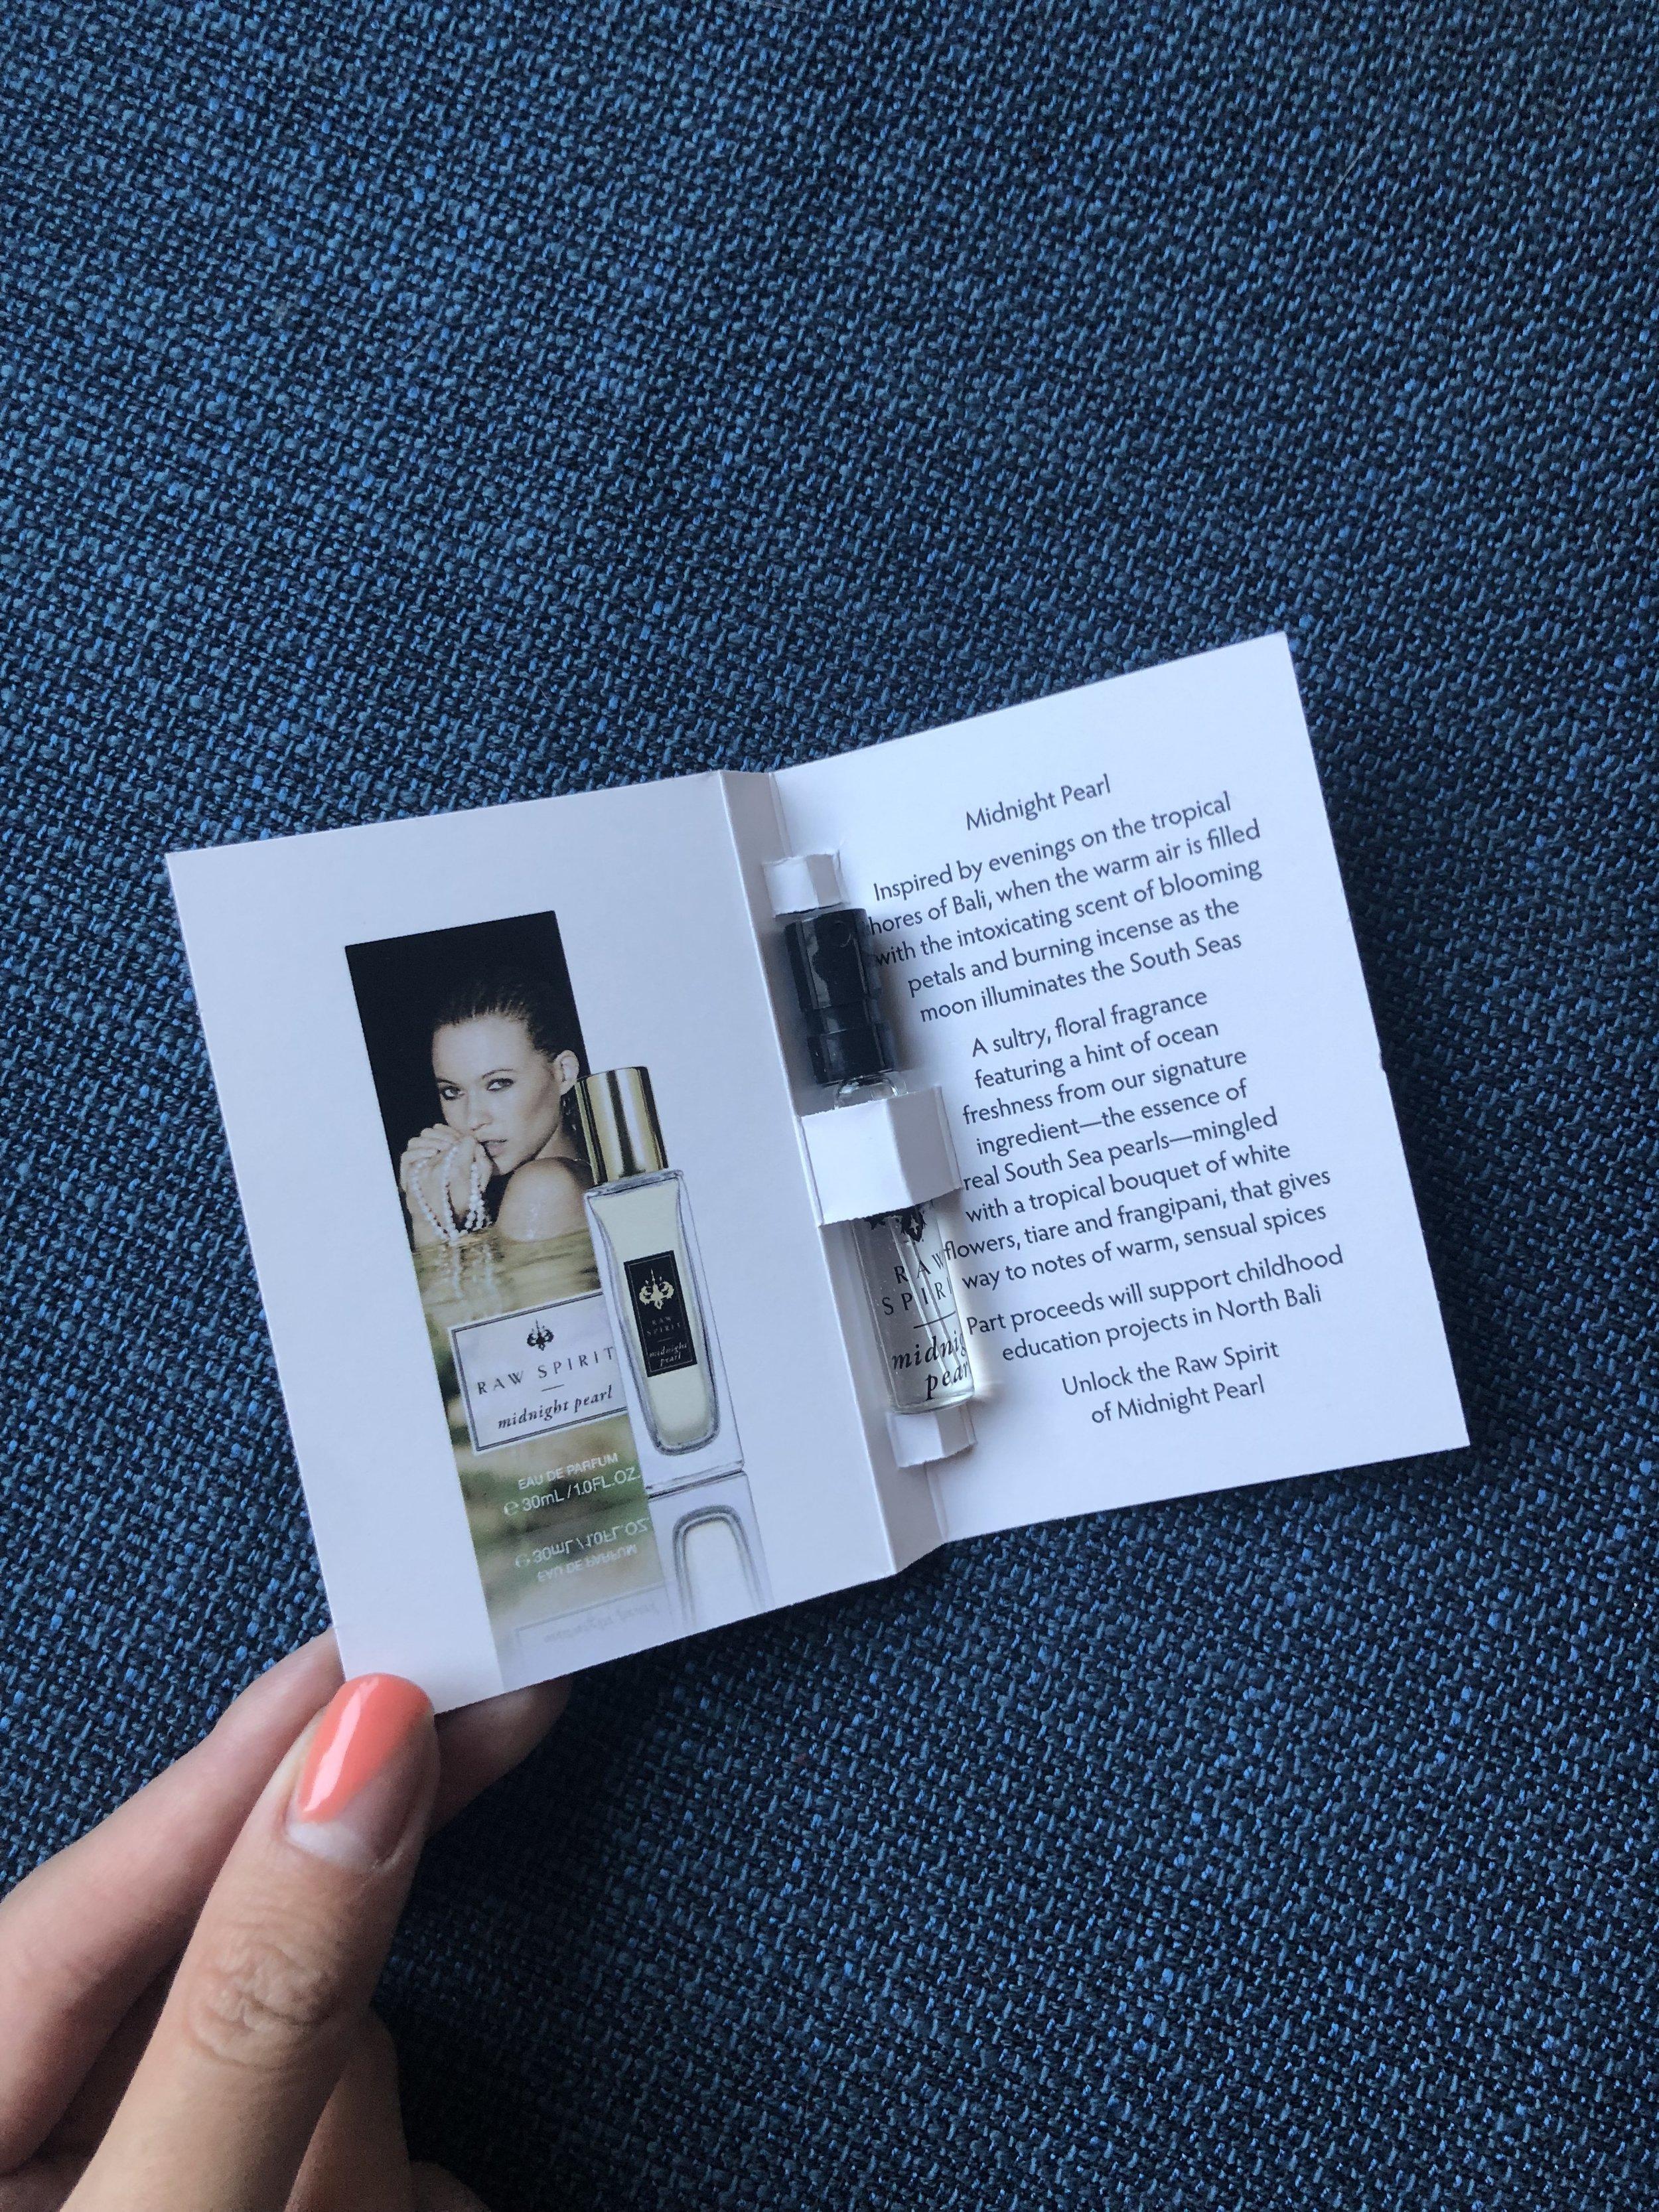 Raw Spirit: Midnight Eau de Parfum - Full-Size $85